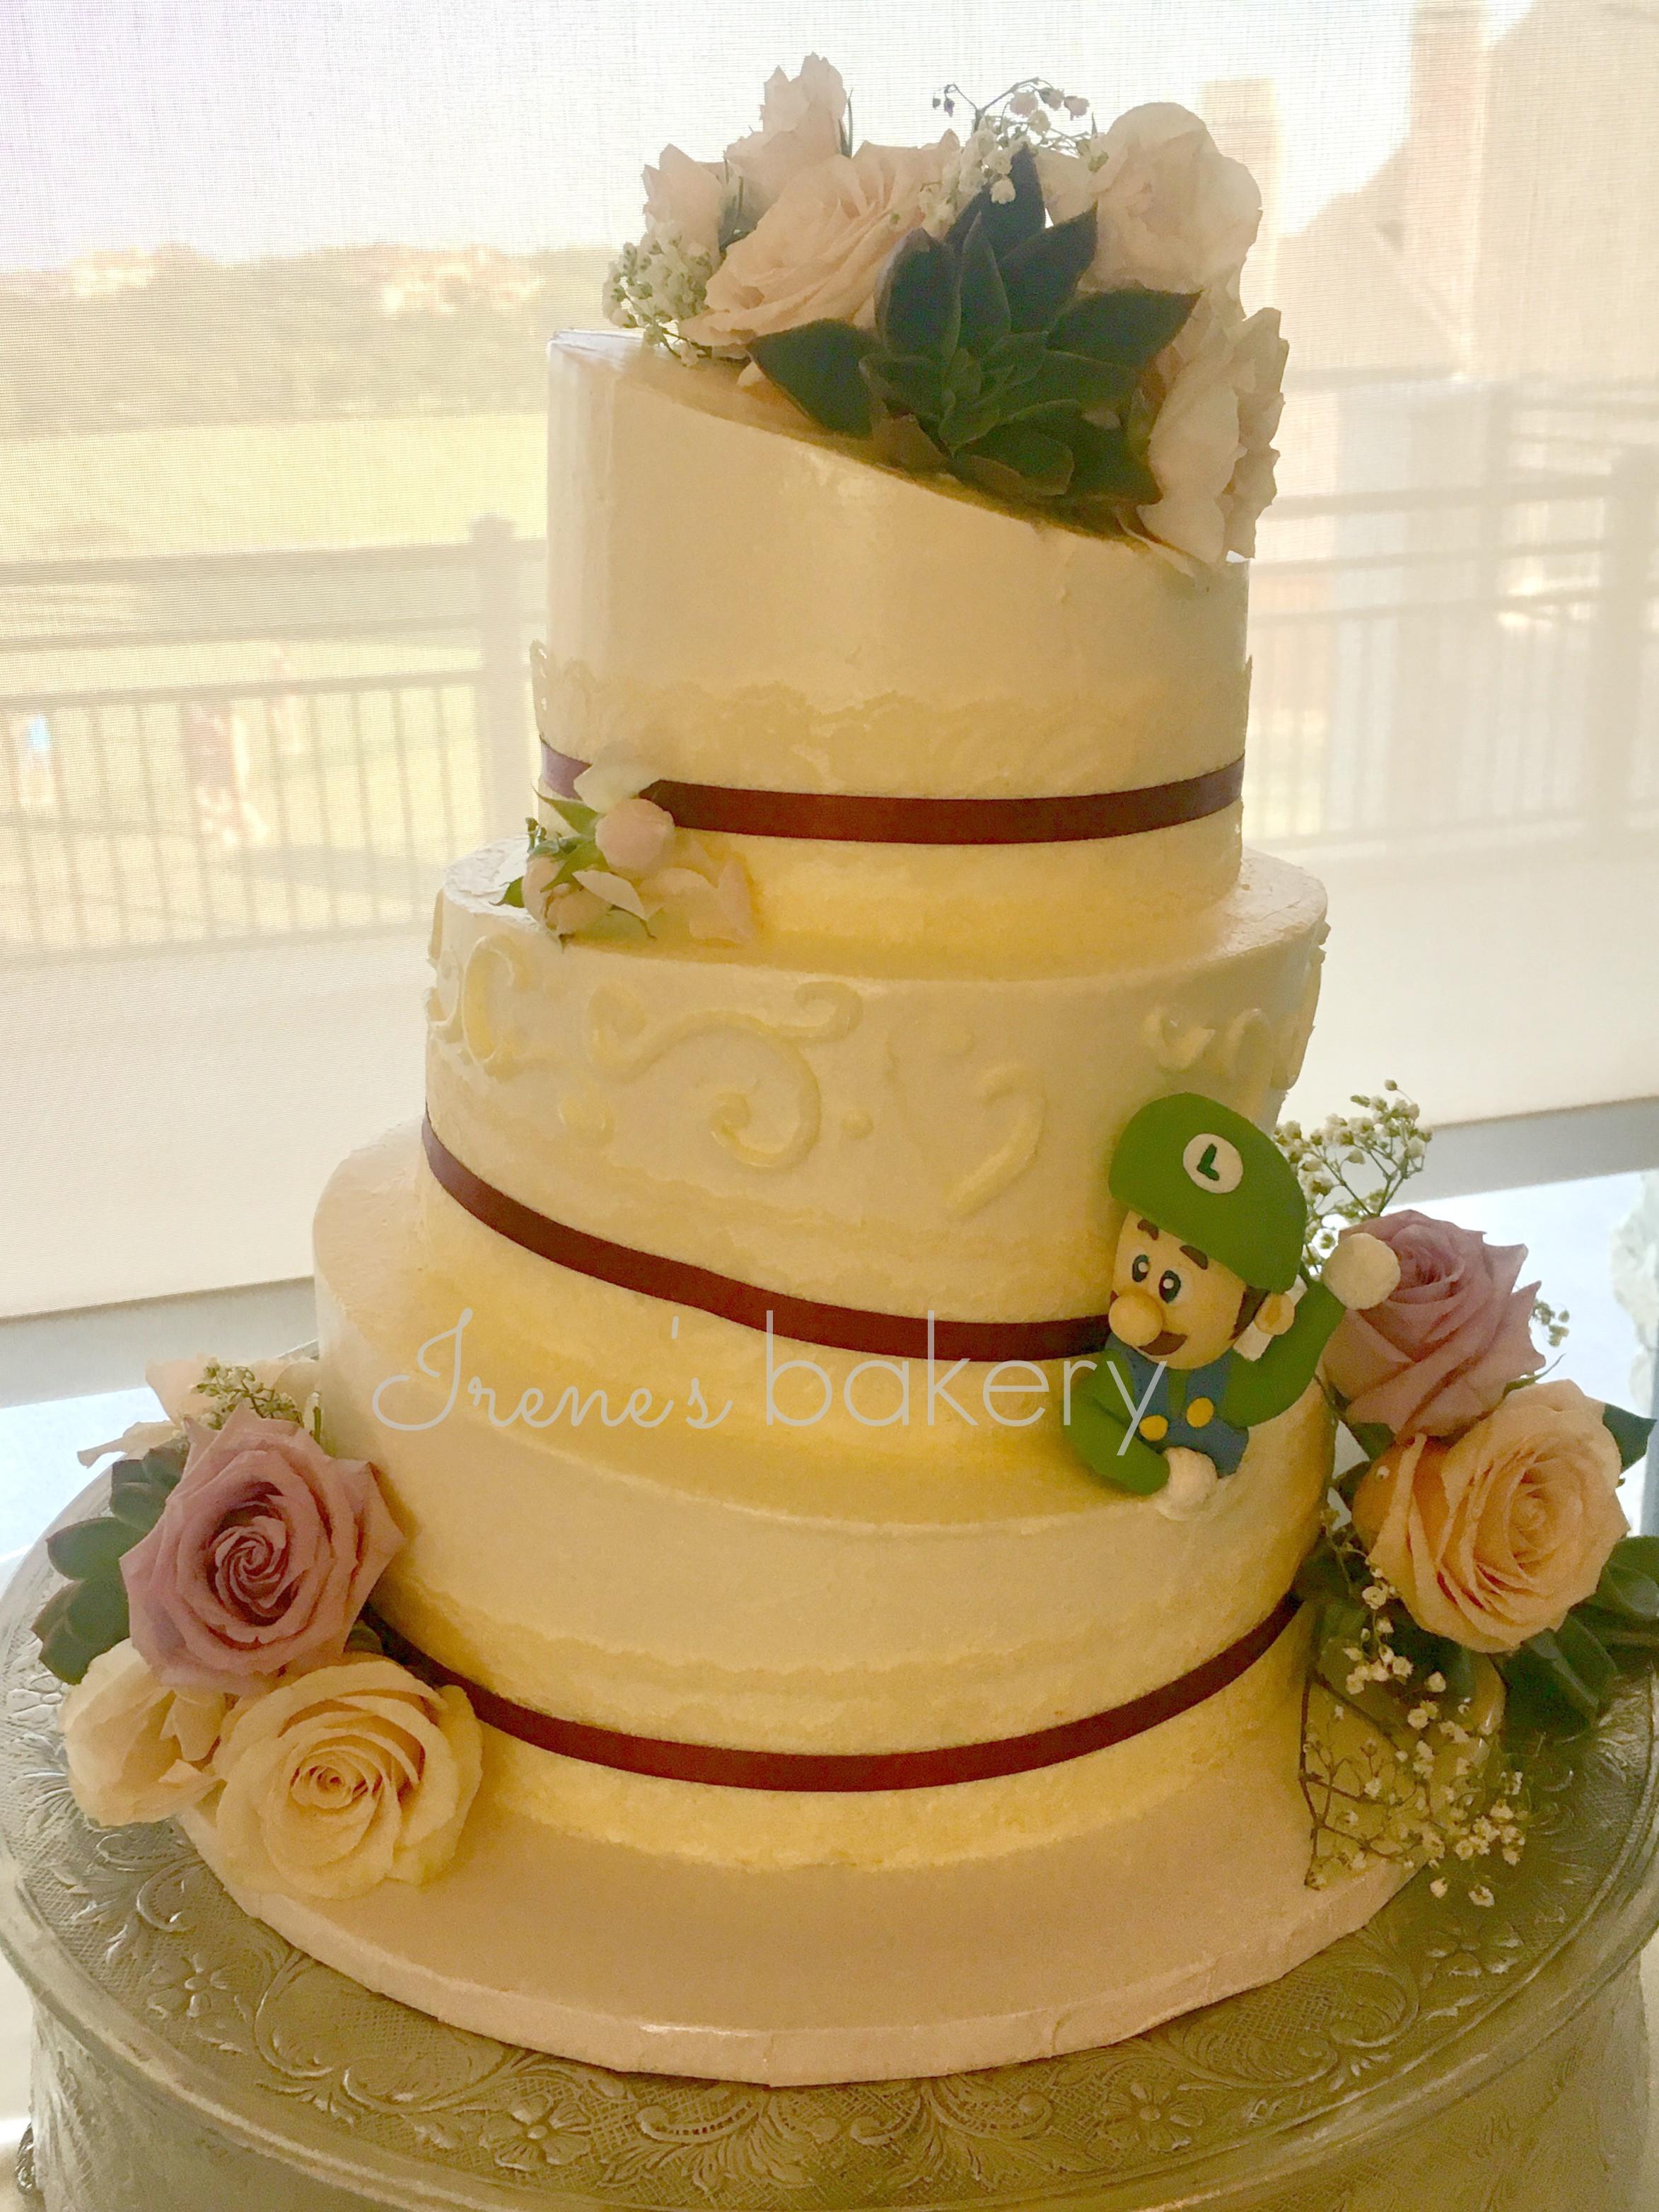 Carlo'S Bakery Wedding Cakes  Wedding Cakes irenes bakery